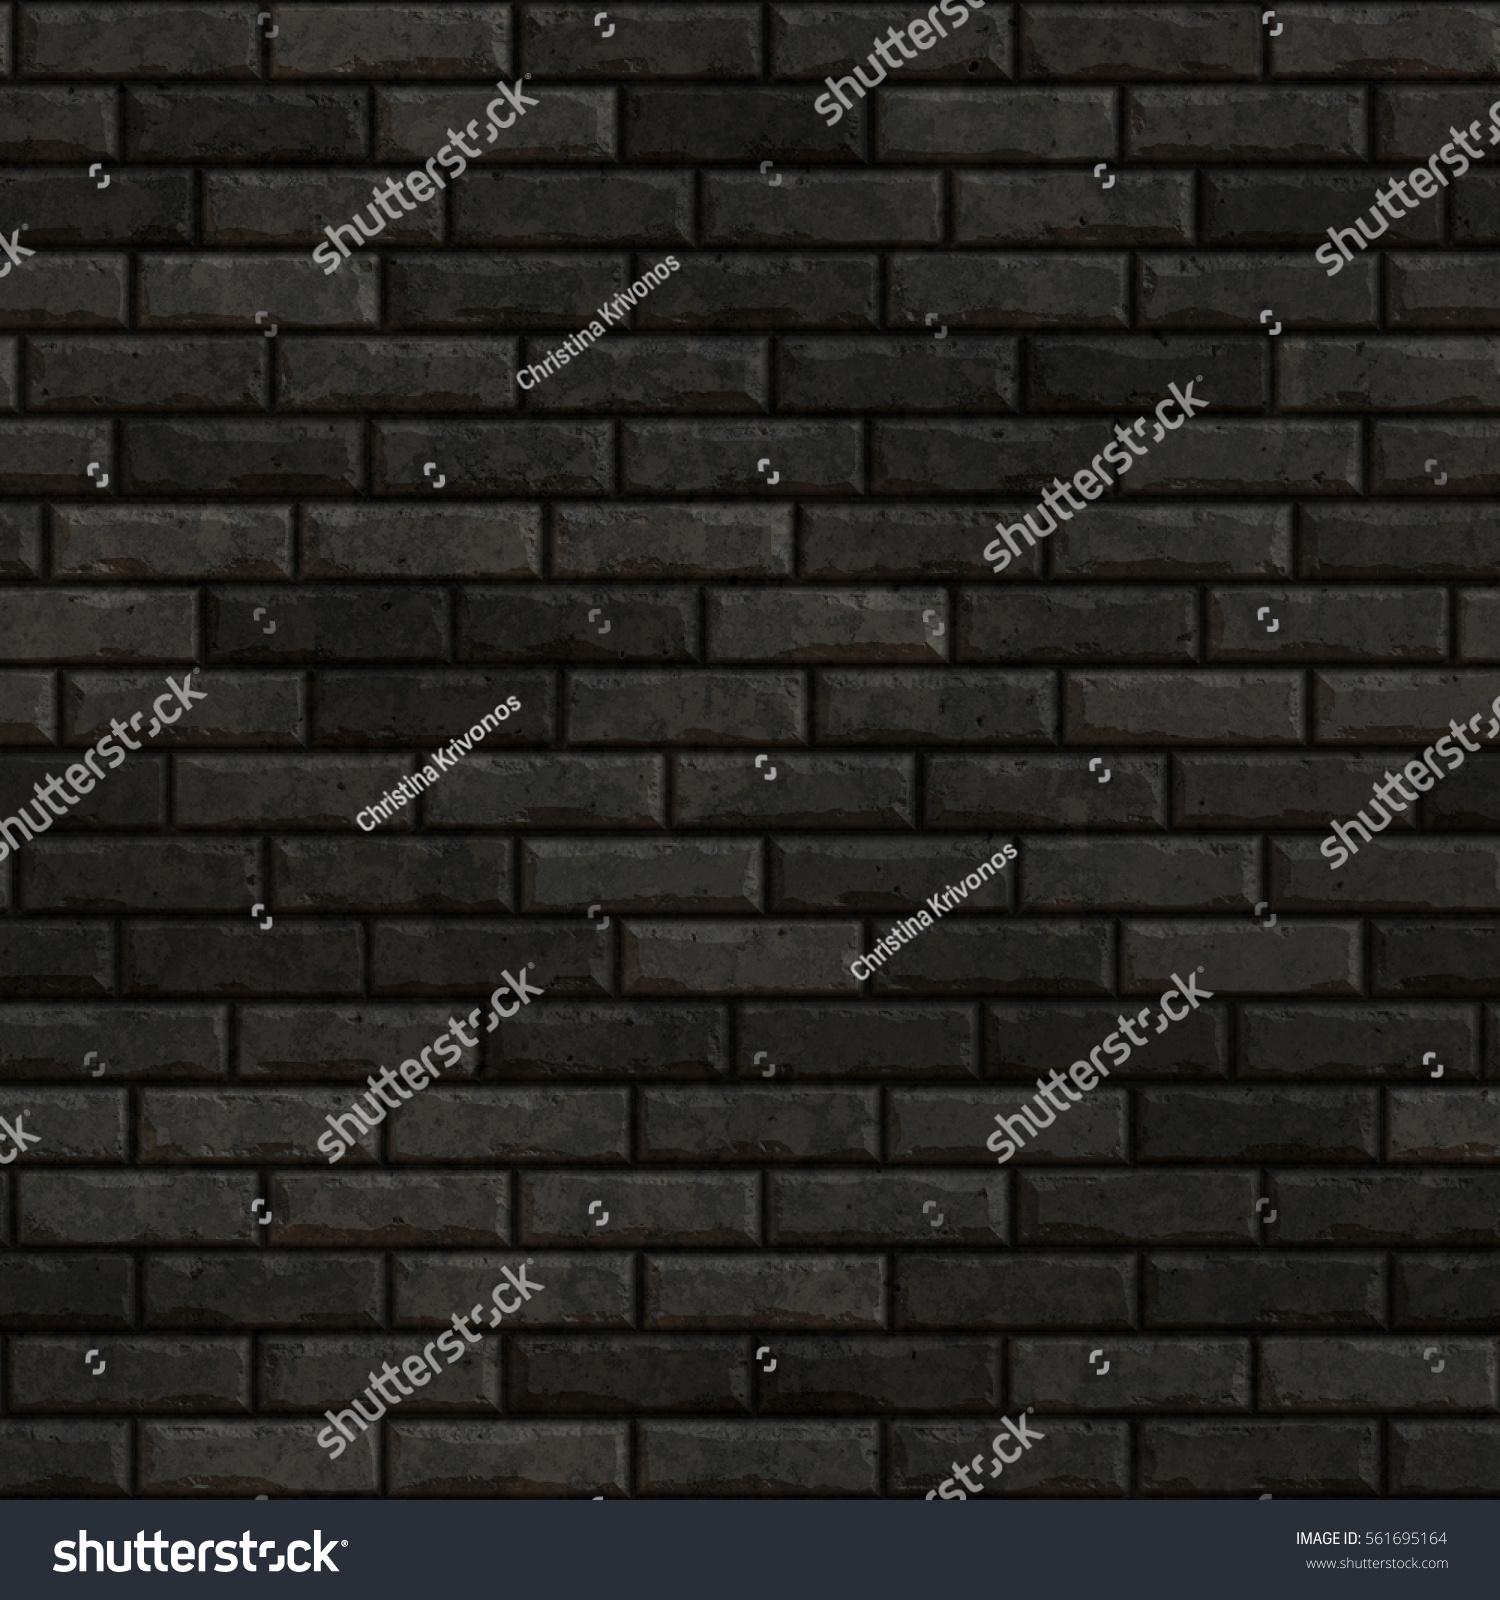 Black Bricks Texture Of A Dark Brick Wall Seamless Background